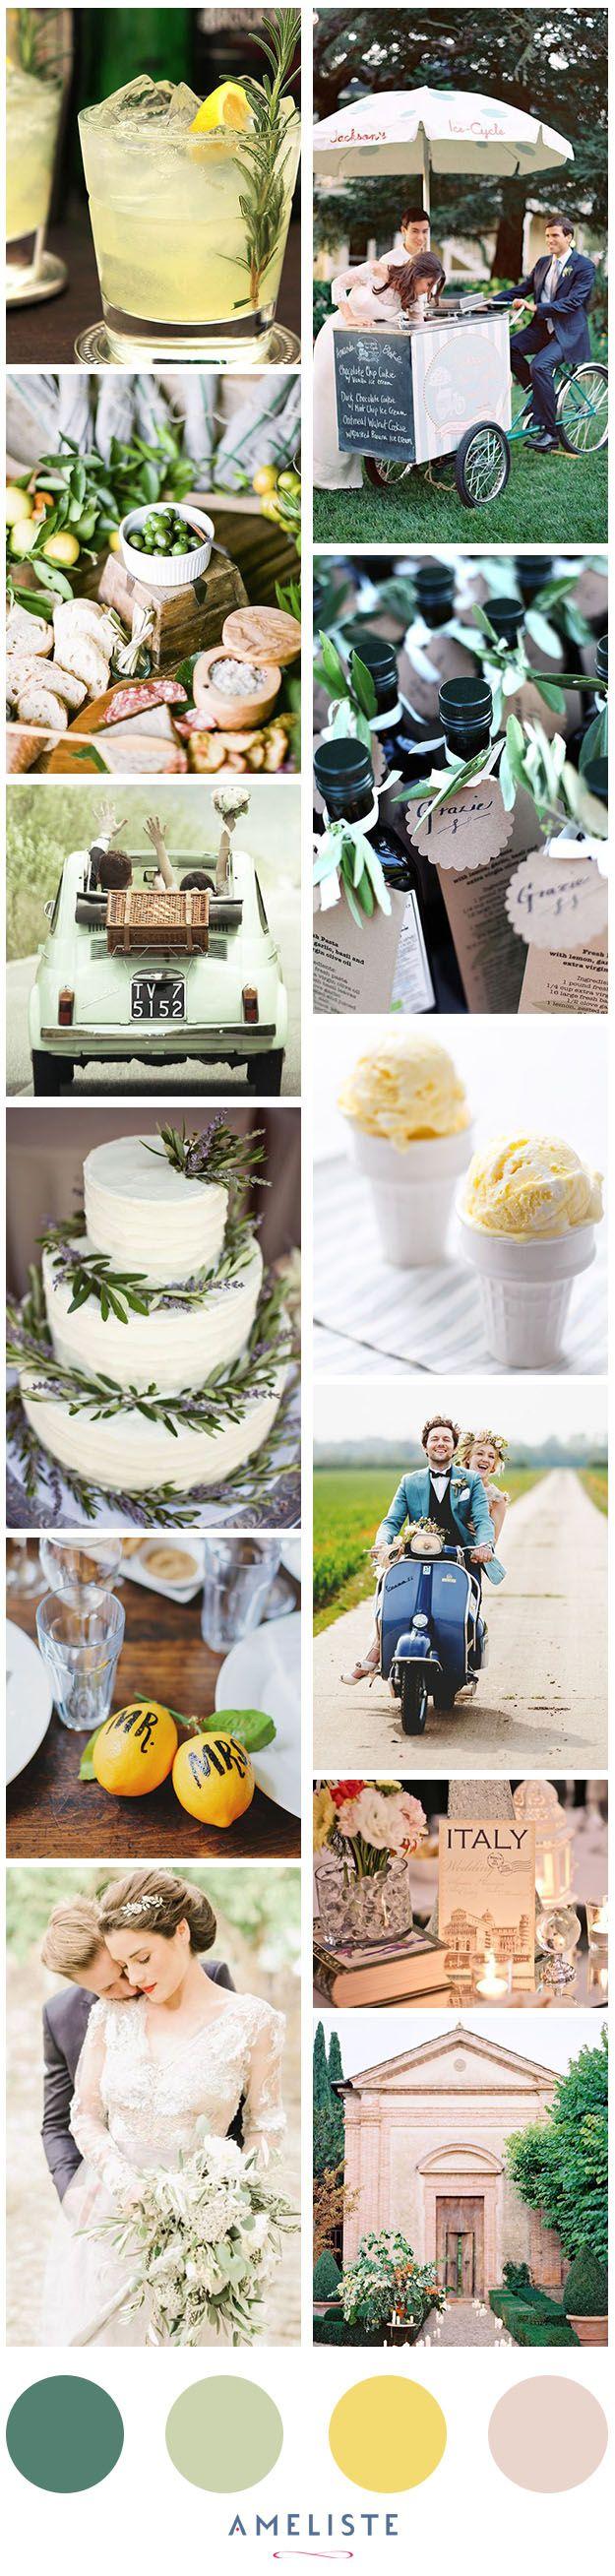 best Wedding reception images on Pinterest  Wedding ideas